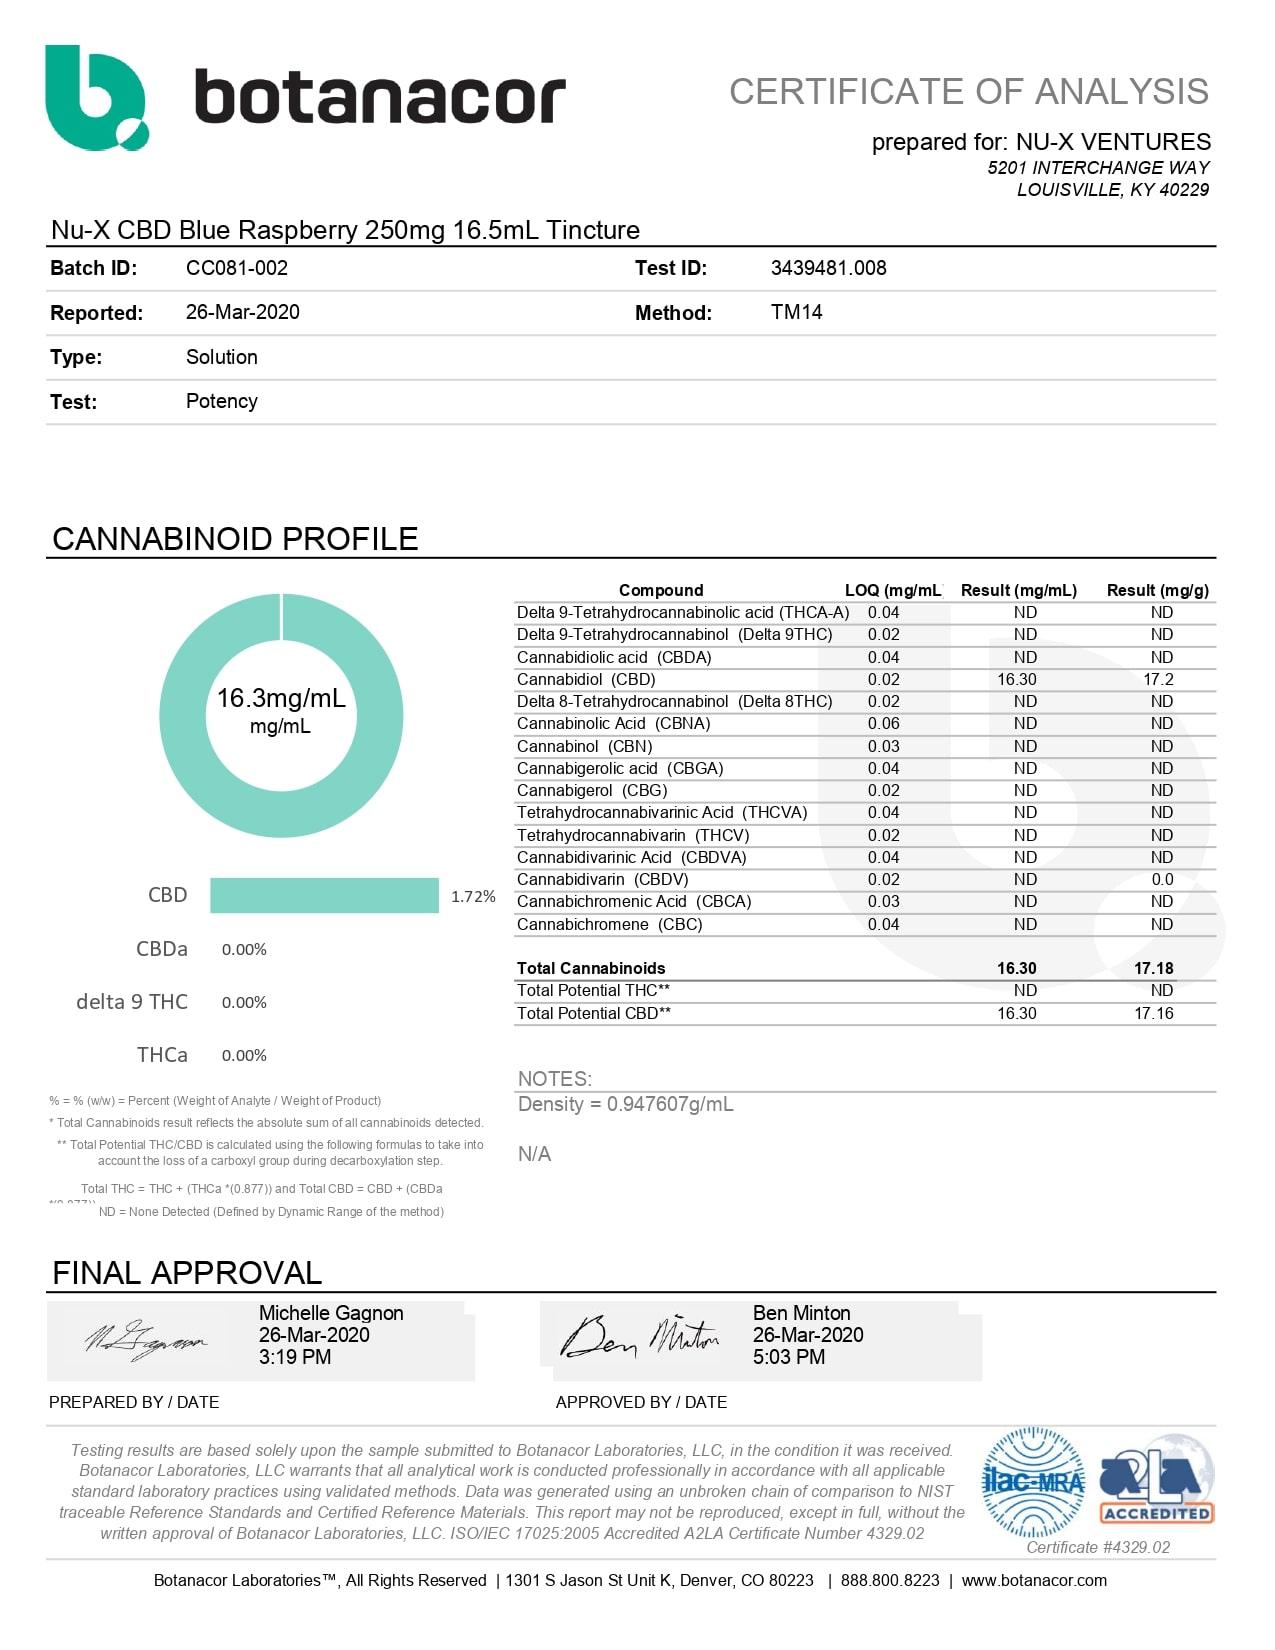 NU-X CBD Tincture Lab Report Blue Raspberry 250mg